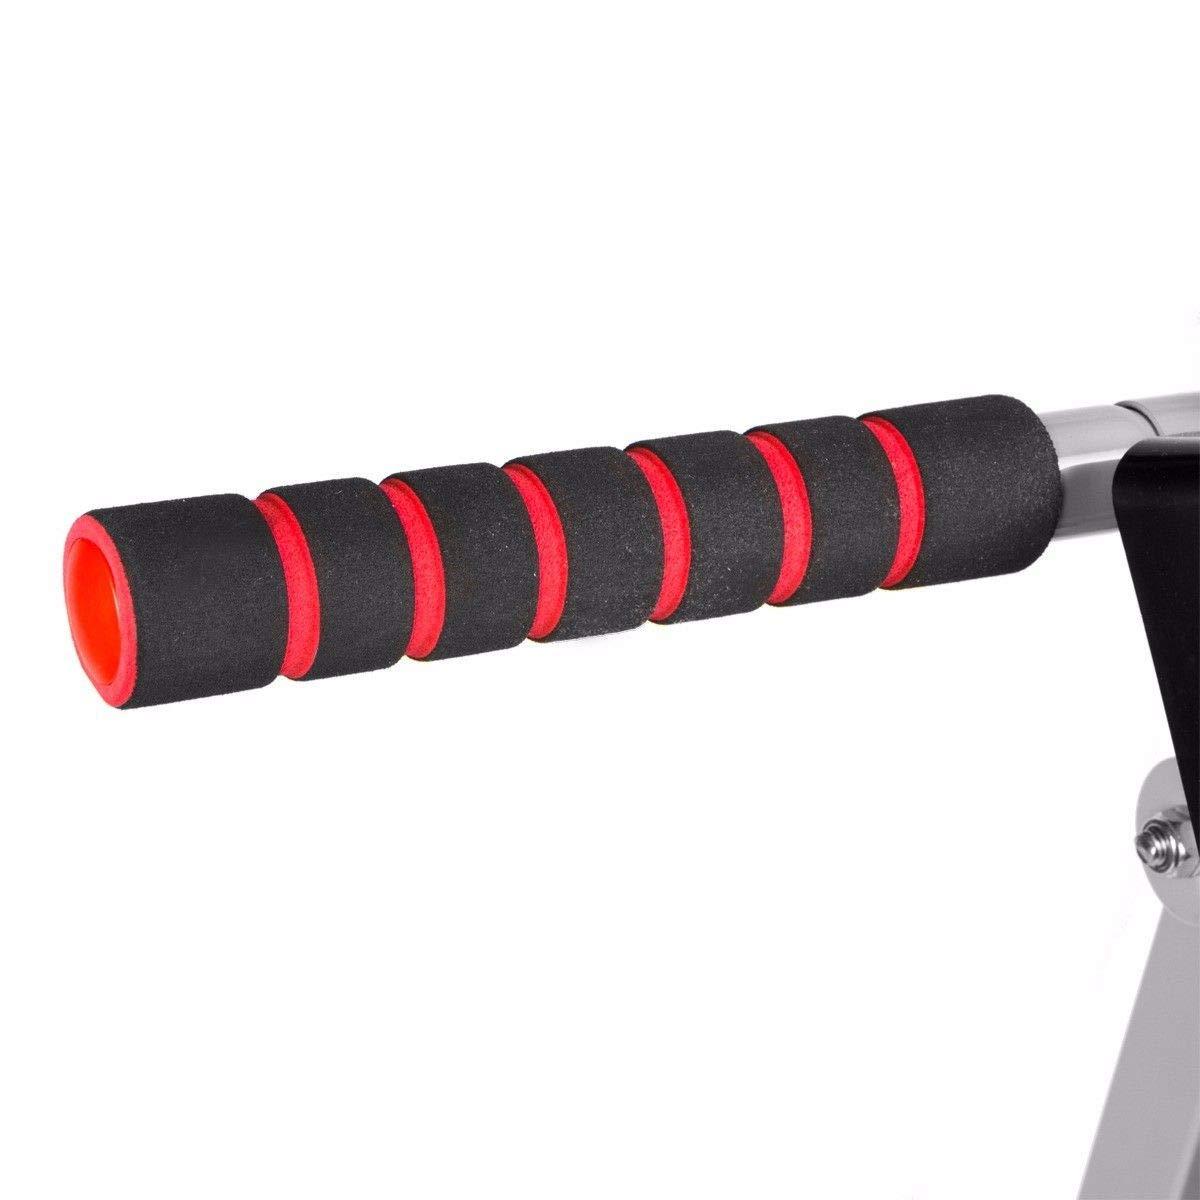 XtremepowerUS Vertical Climber Fitness Cardio Exercise Machine by XtremepowerUS (Image #7)